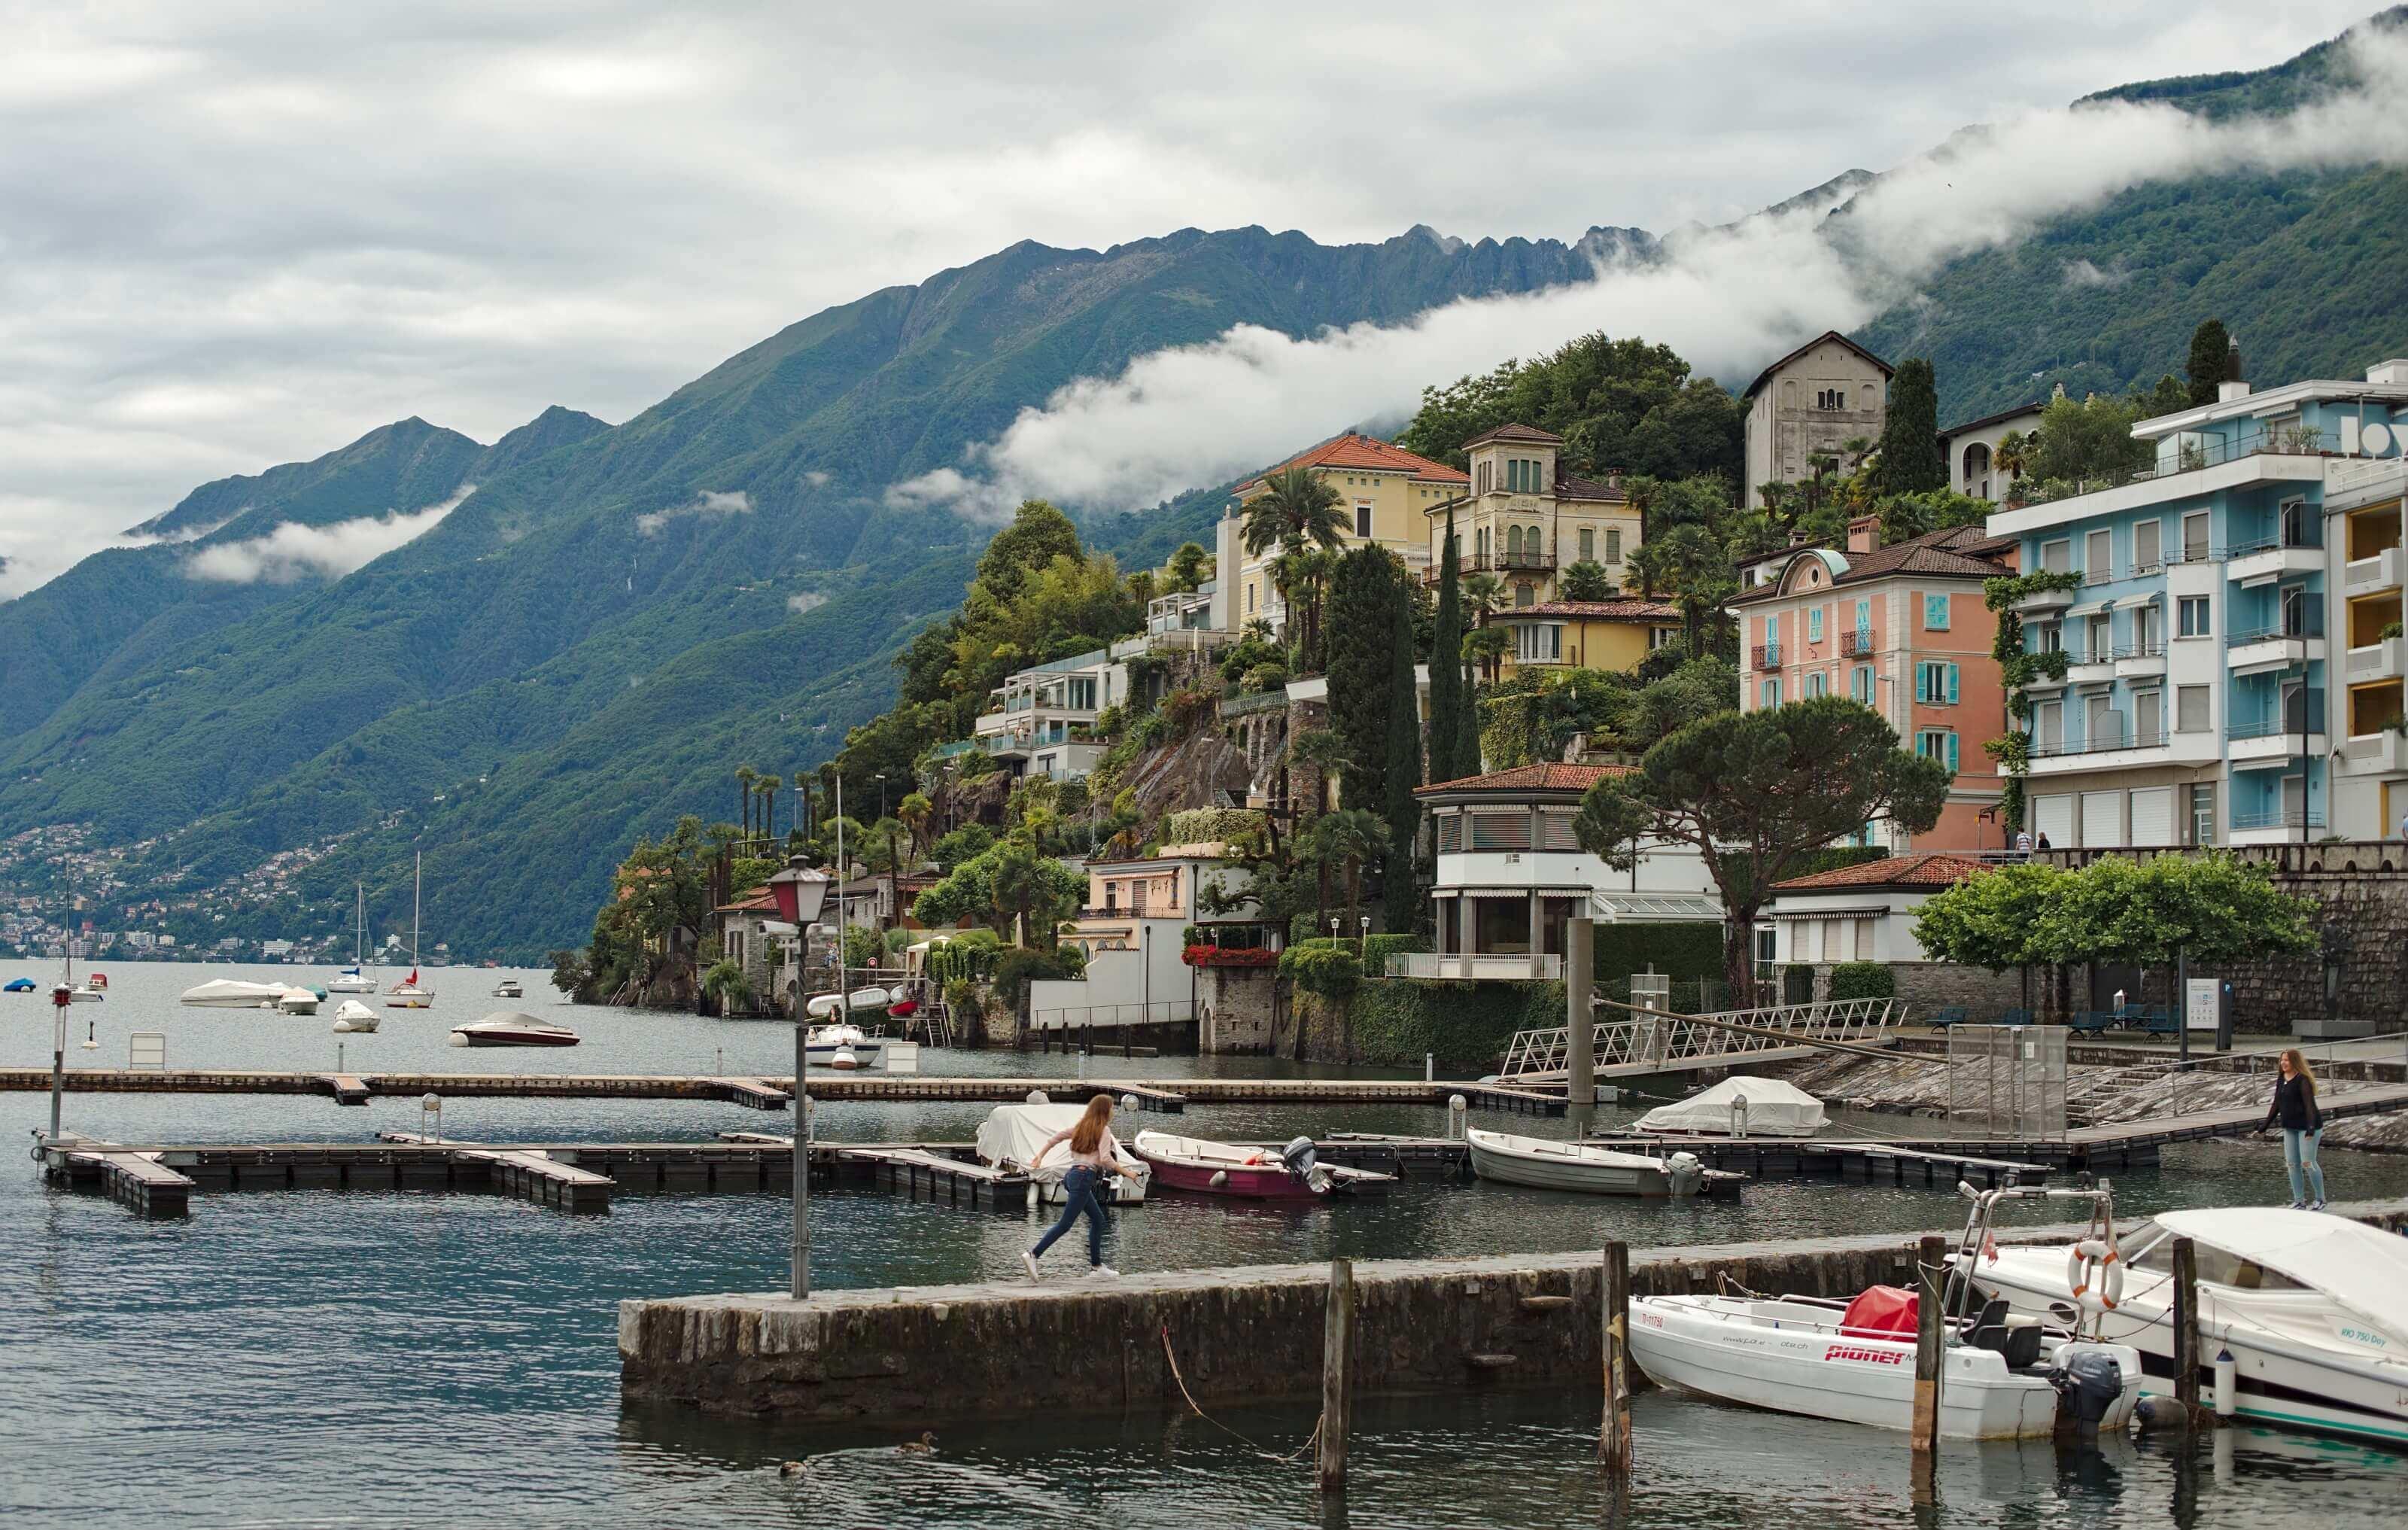 le port d'ascona